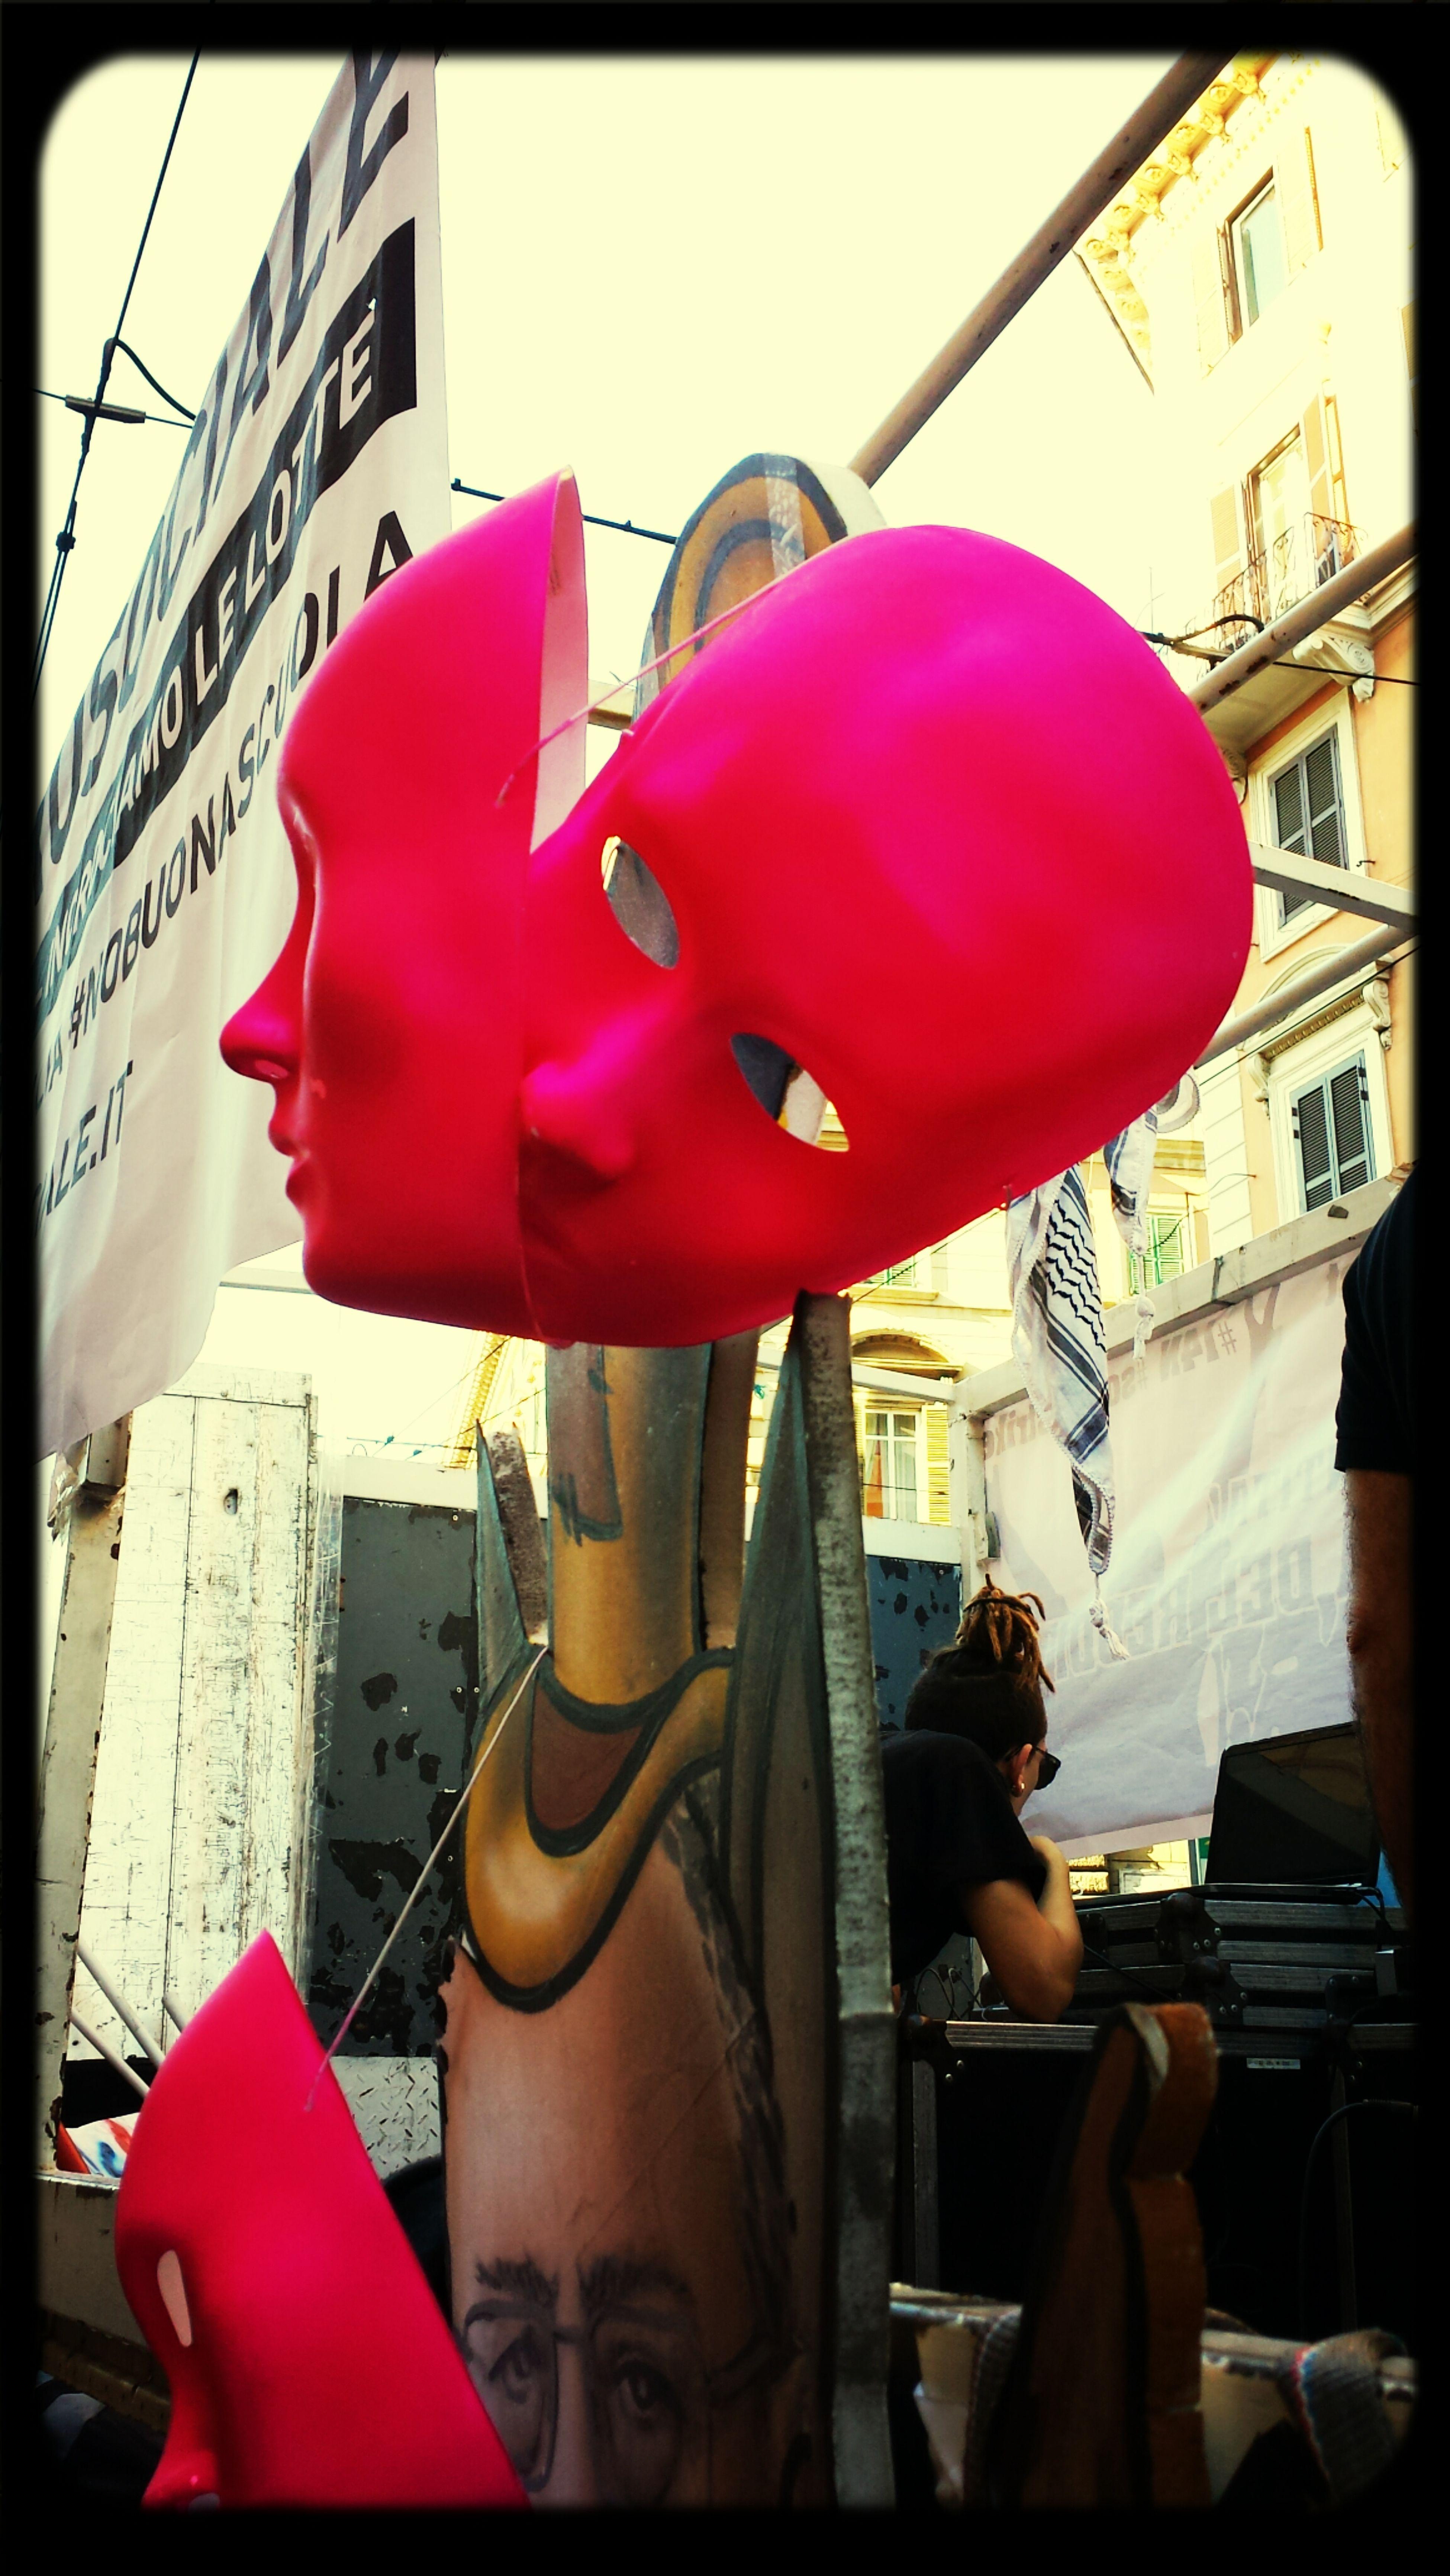 14novembre Socialstrike Genderstrike Demonstration